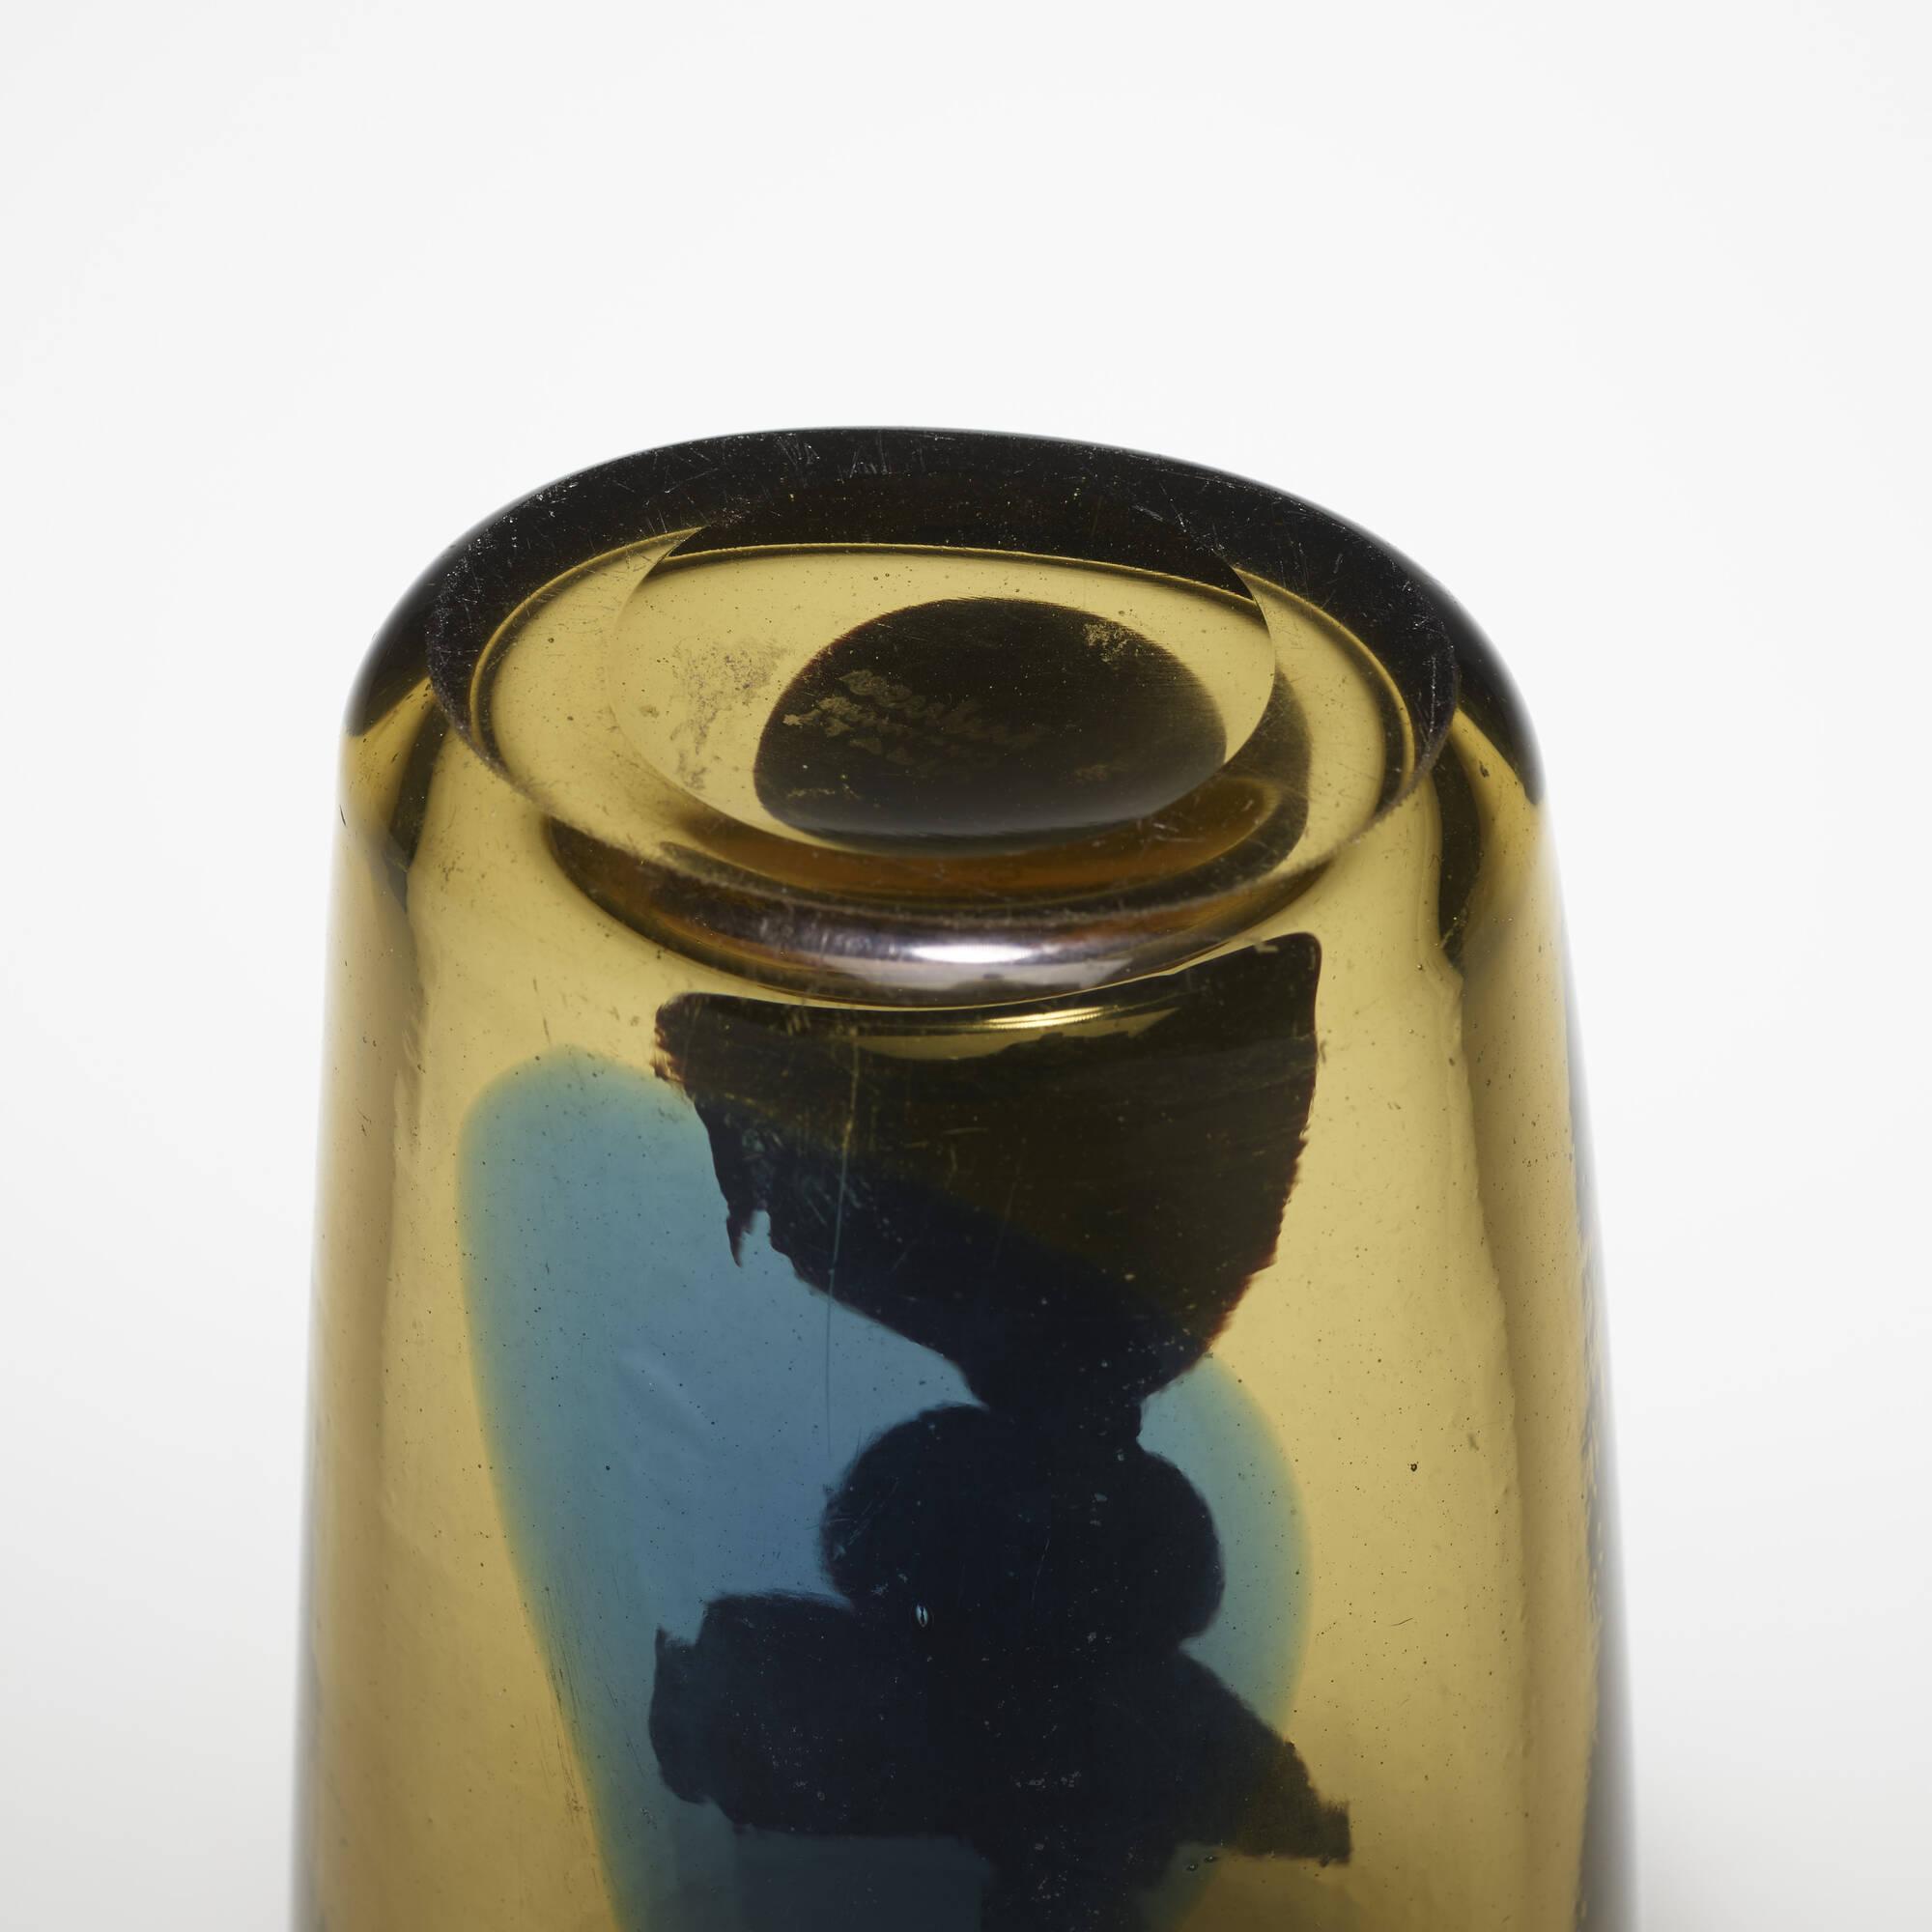 136: Fulvio Bianconi / Con Macchie vase (4 of 4)